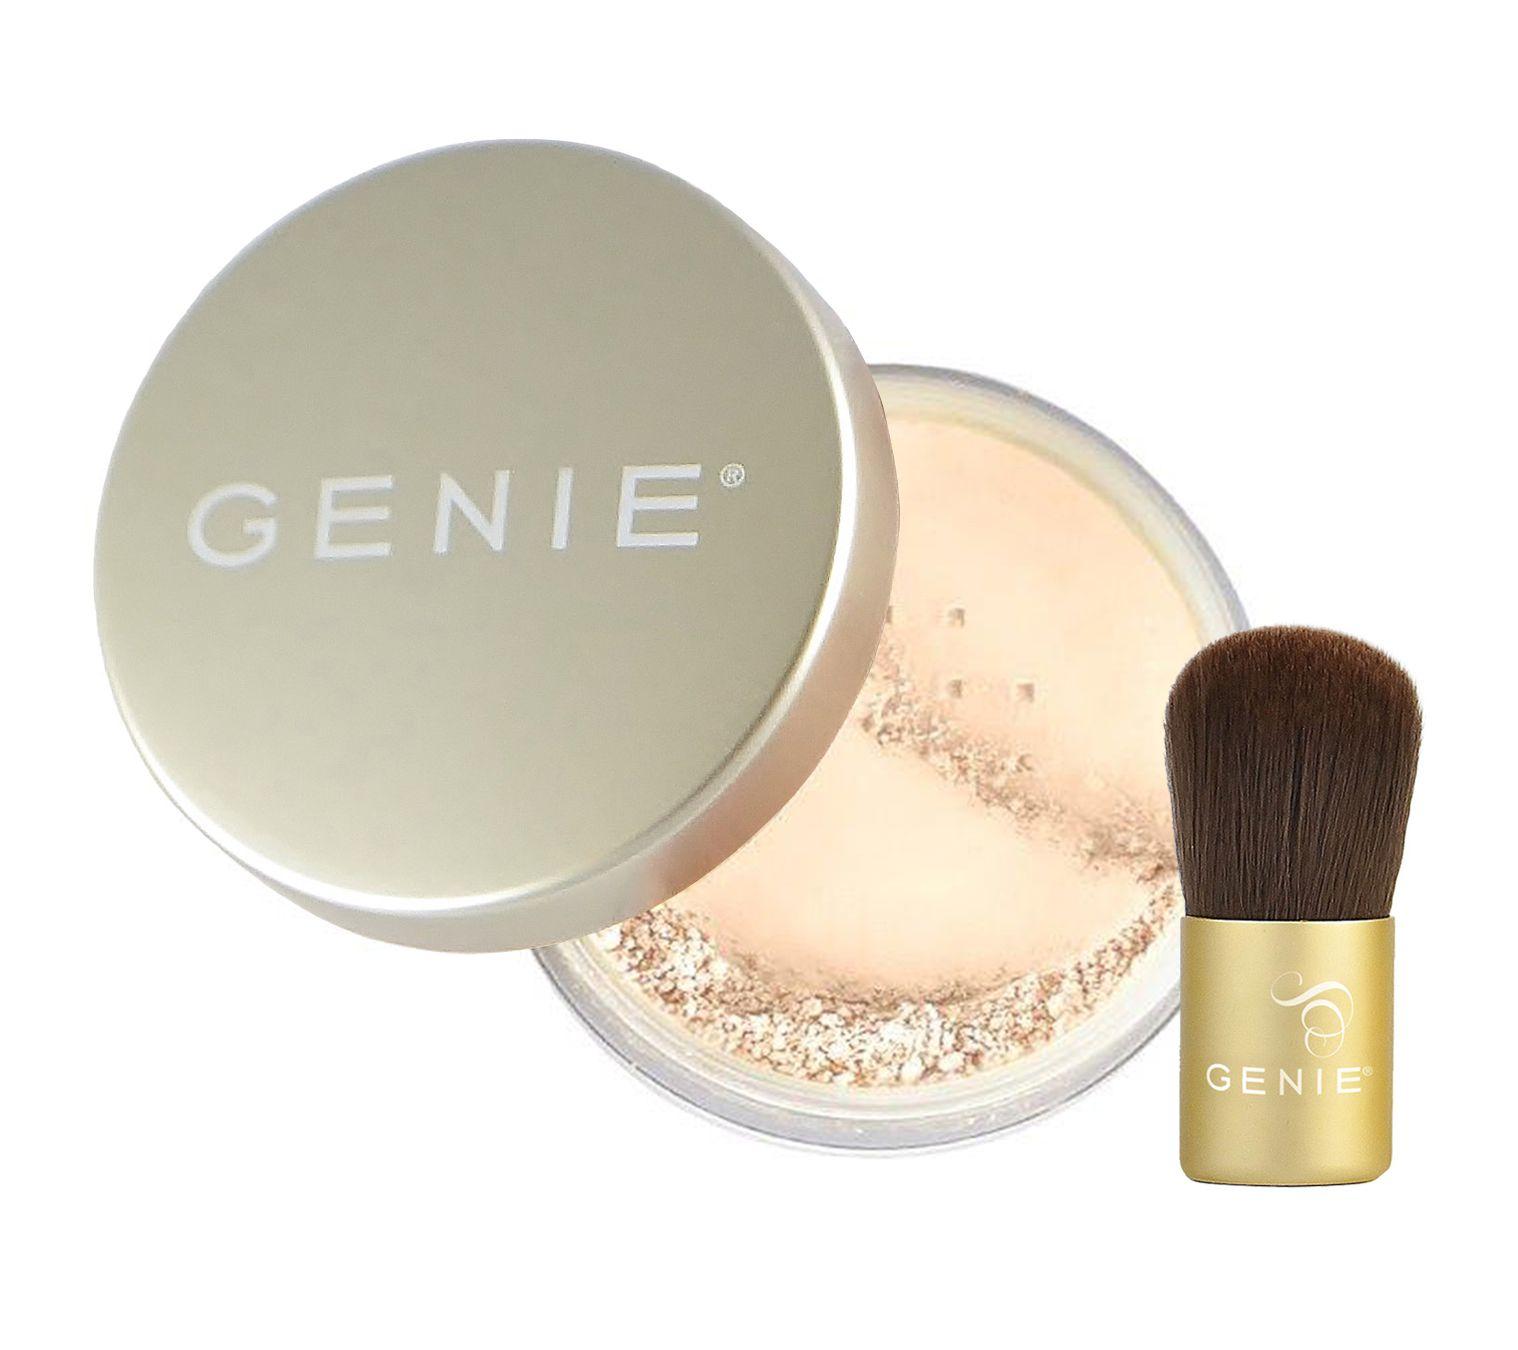 Genie Full Coverage Mineral Foundation